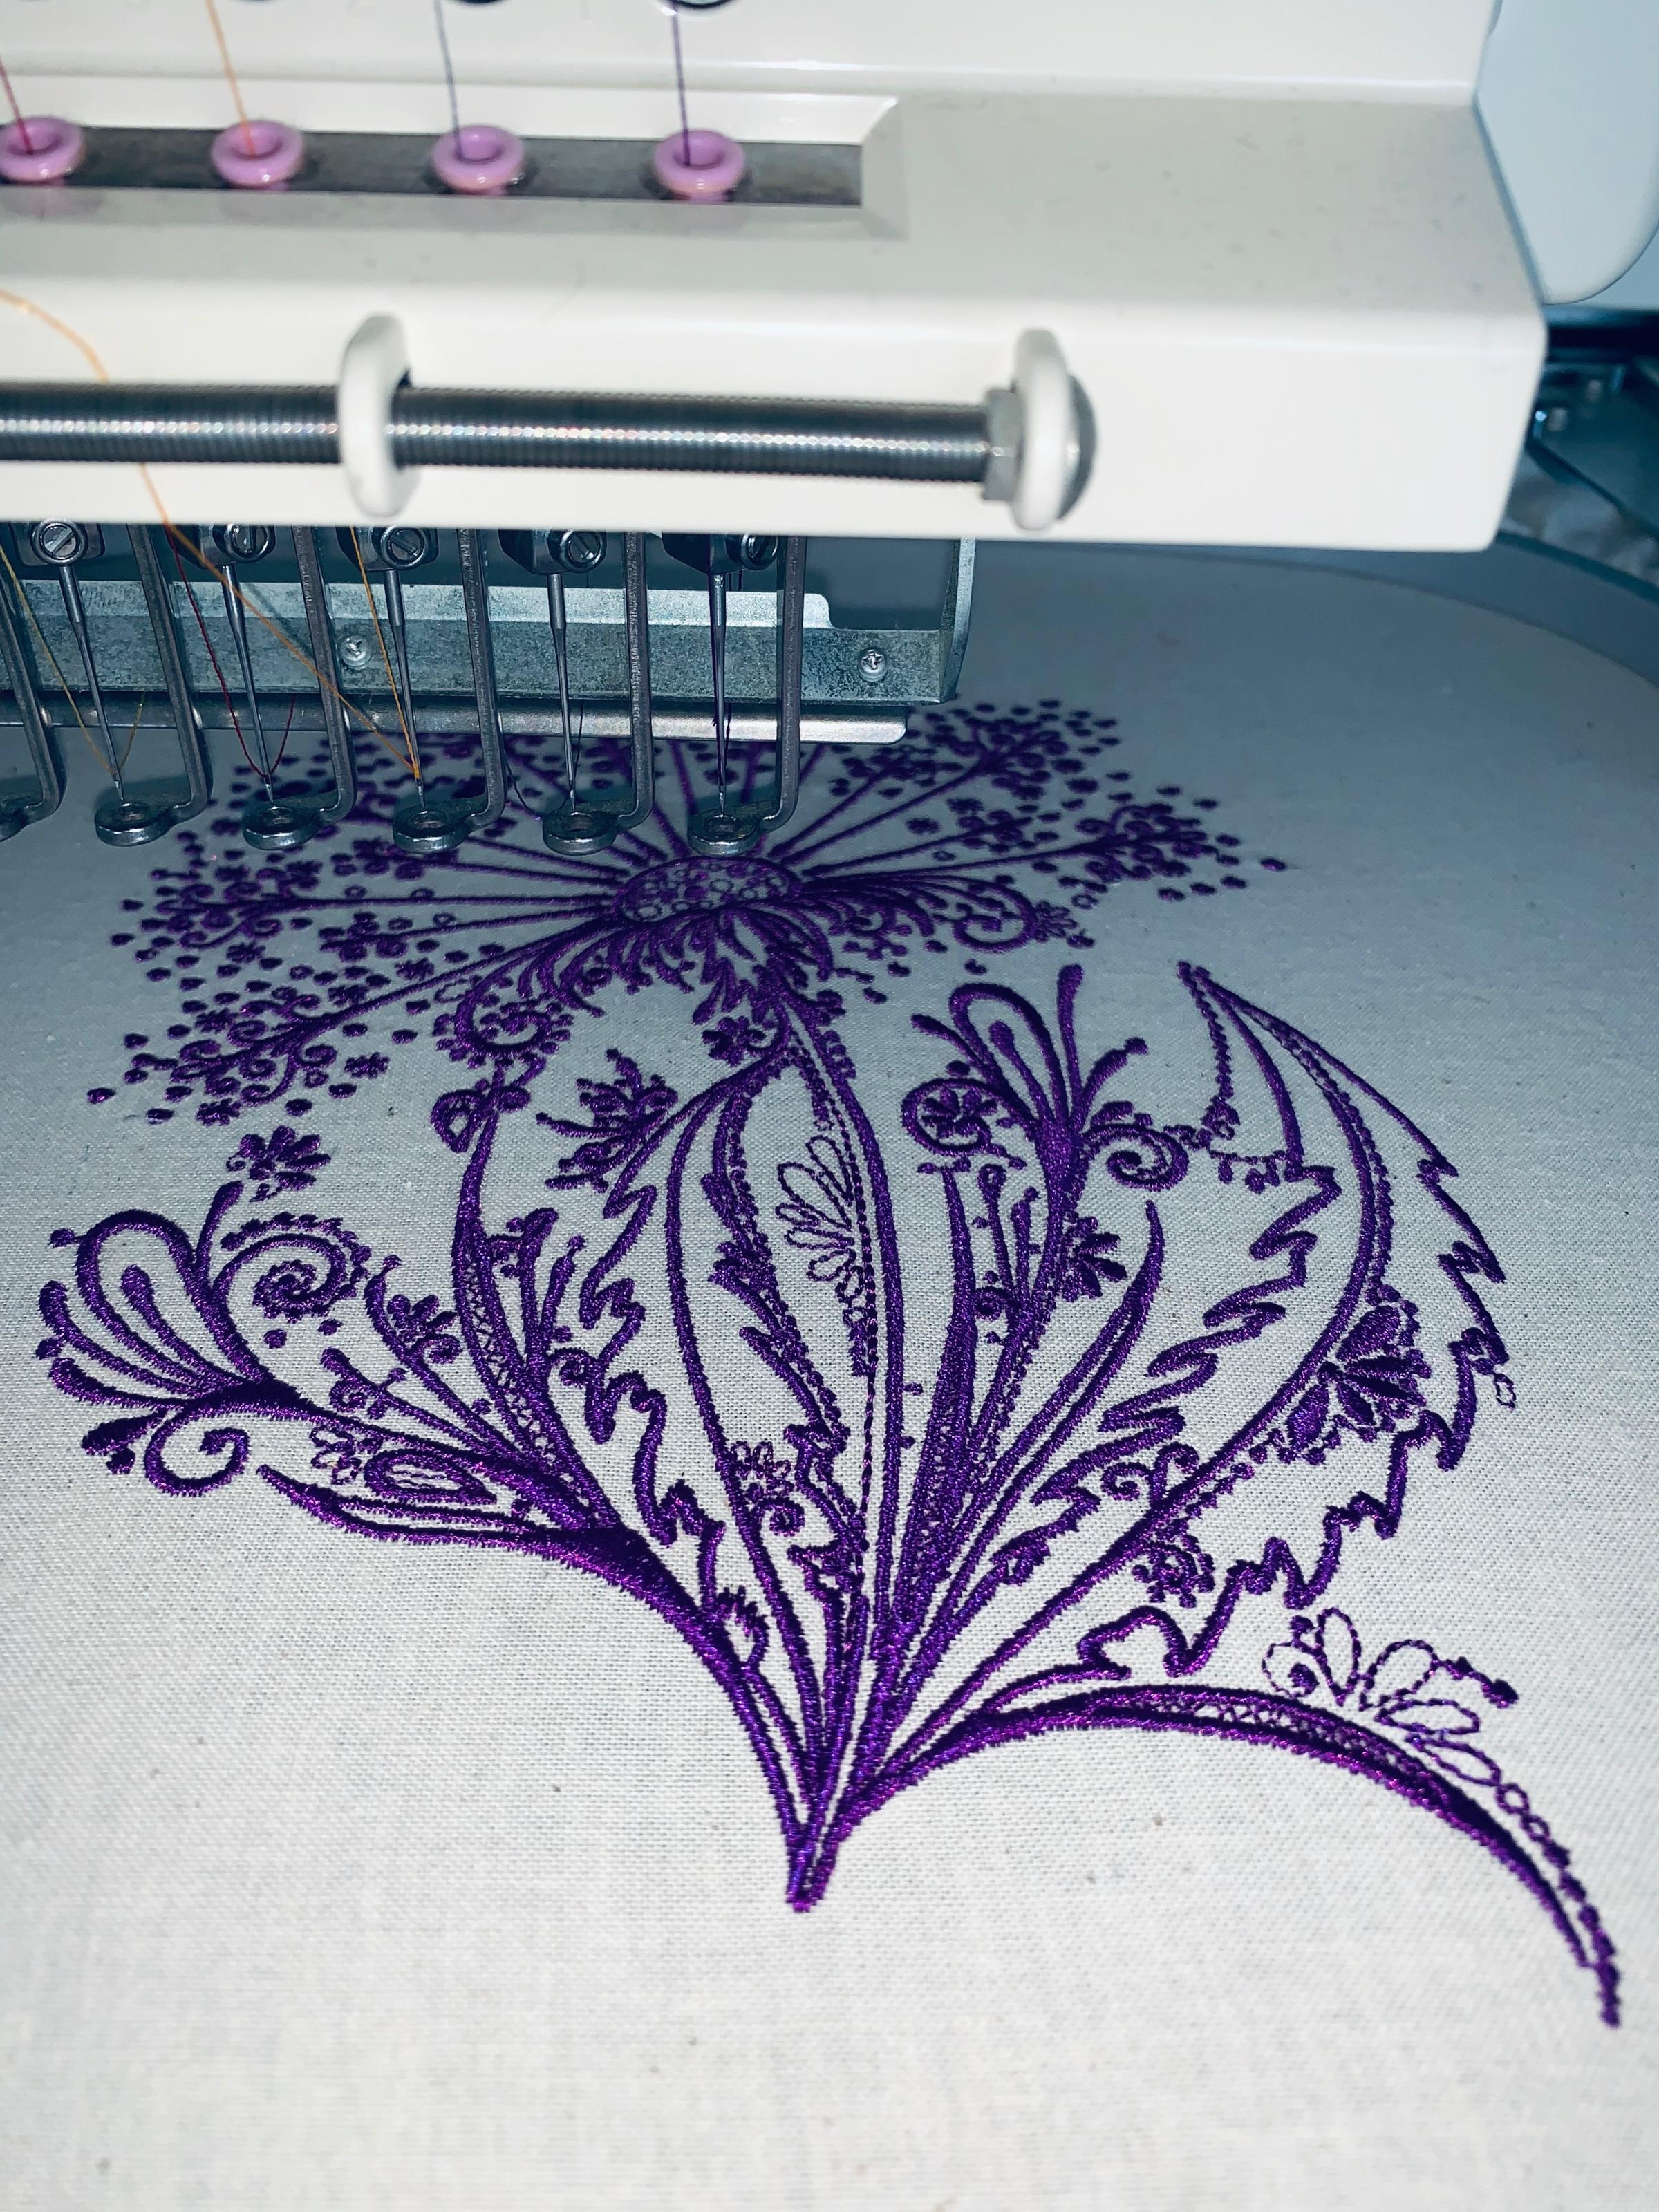 Dandelion embroidery design in sewing machine.